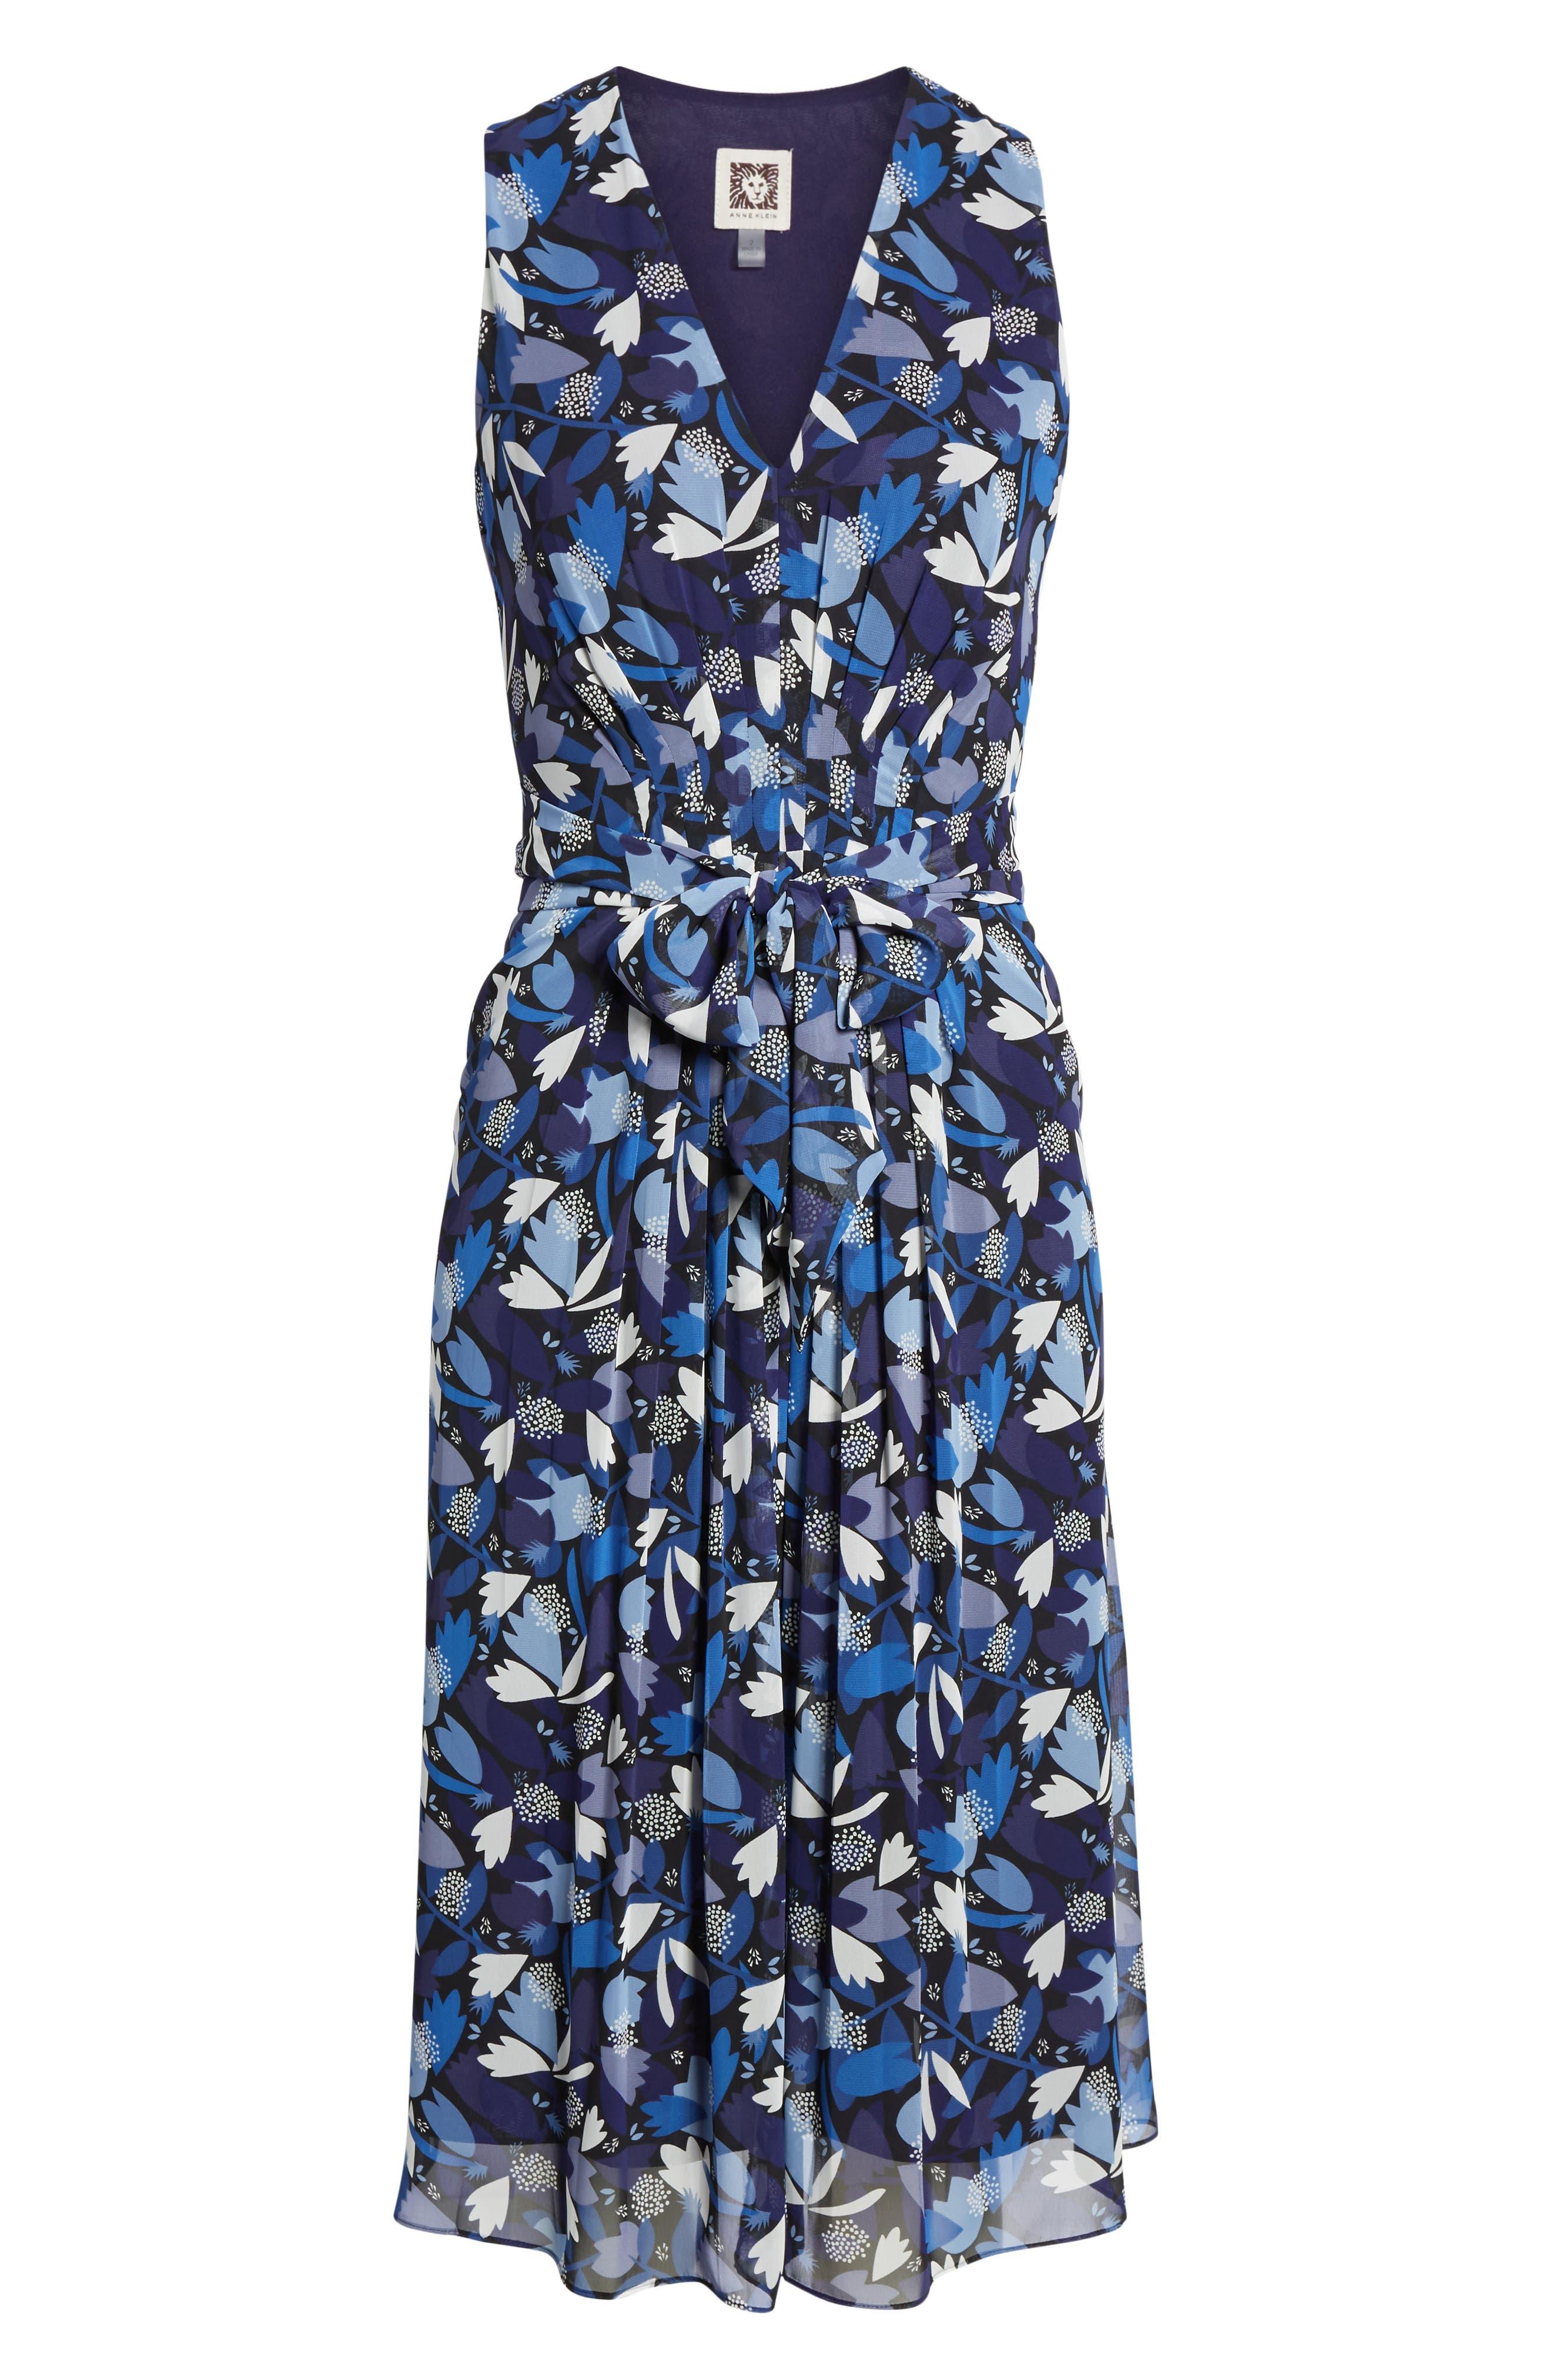 Amalfi Print Chiffon Dress,                             Alternate thumbnail 6, color,                             410